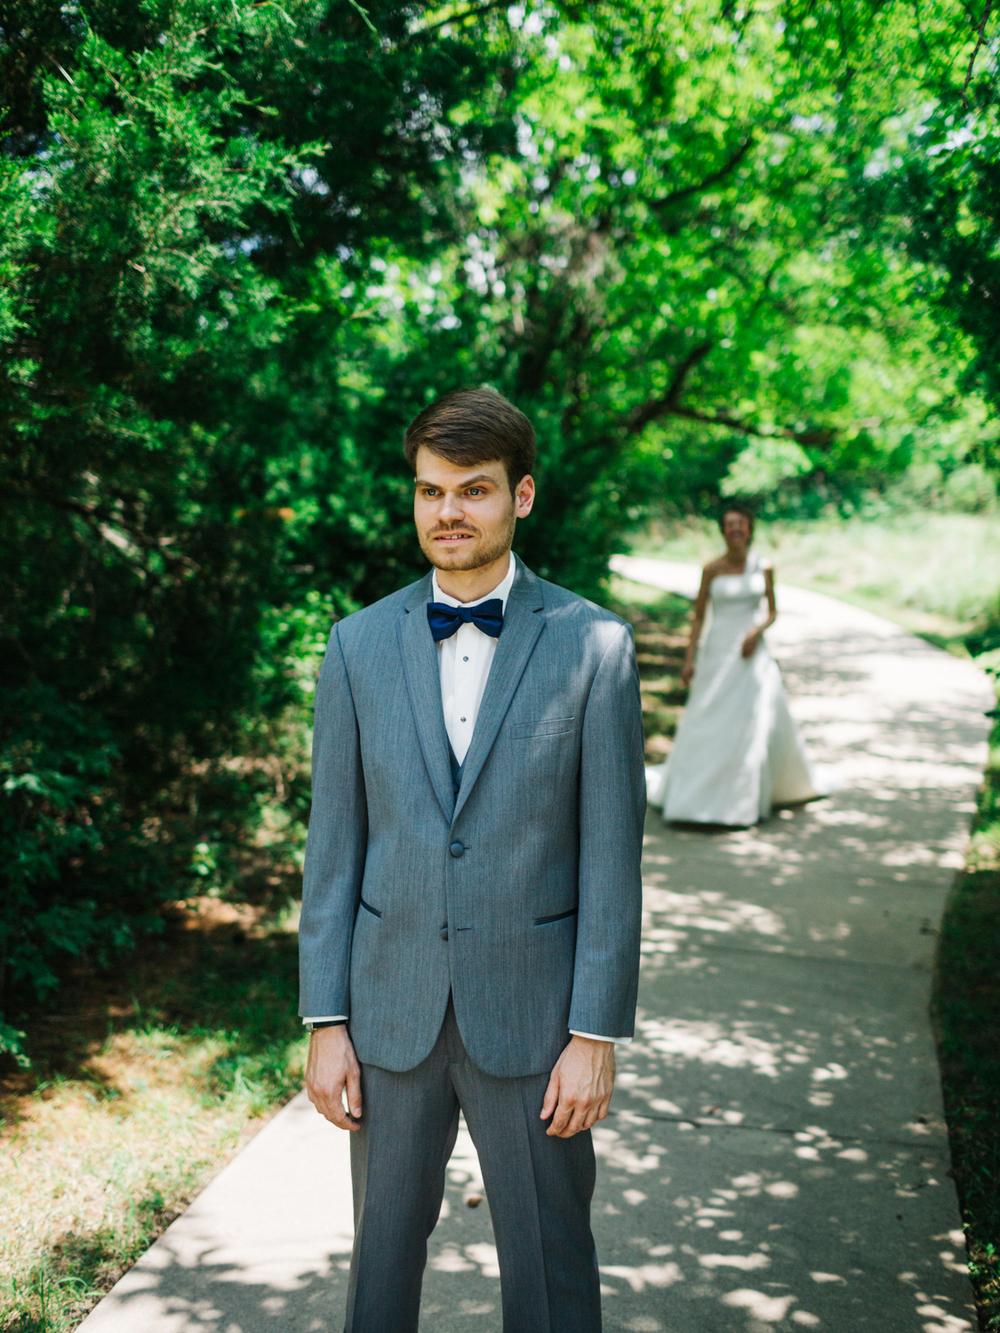 Wichita, Kansas Wedding Photographer - Neal Dieker - Wedding Photography-143.jpg